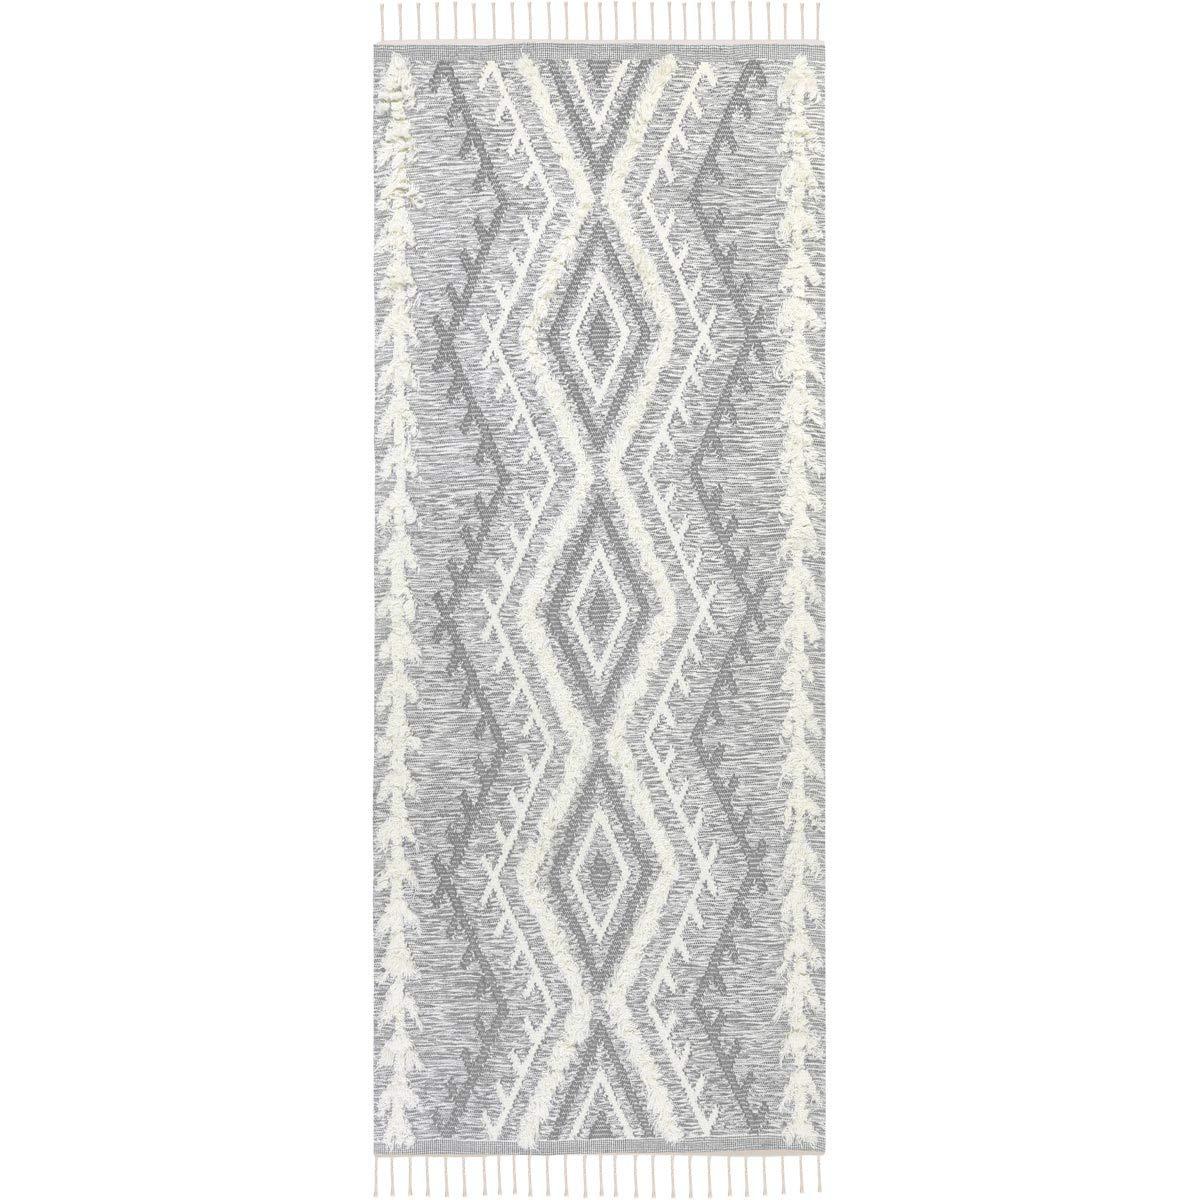 We Rugs Beautiful Area Rugs for Living Room Decor, Modern Geometric Handmade Area Rug,Light Grey 2 8 x 8